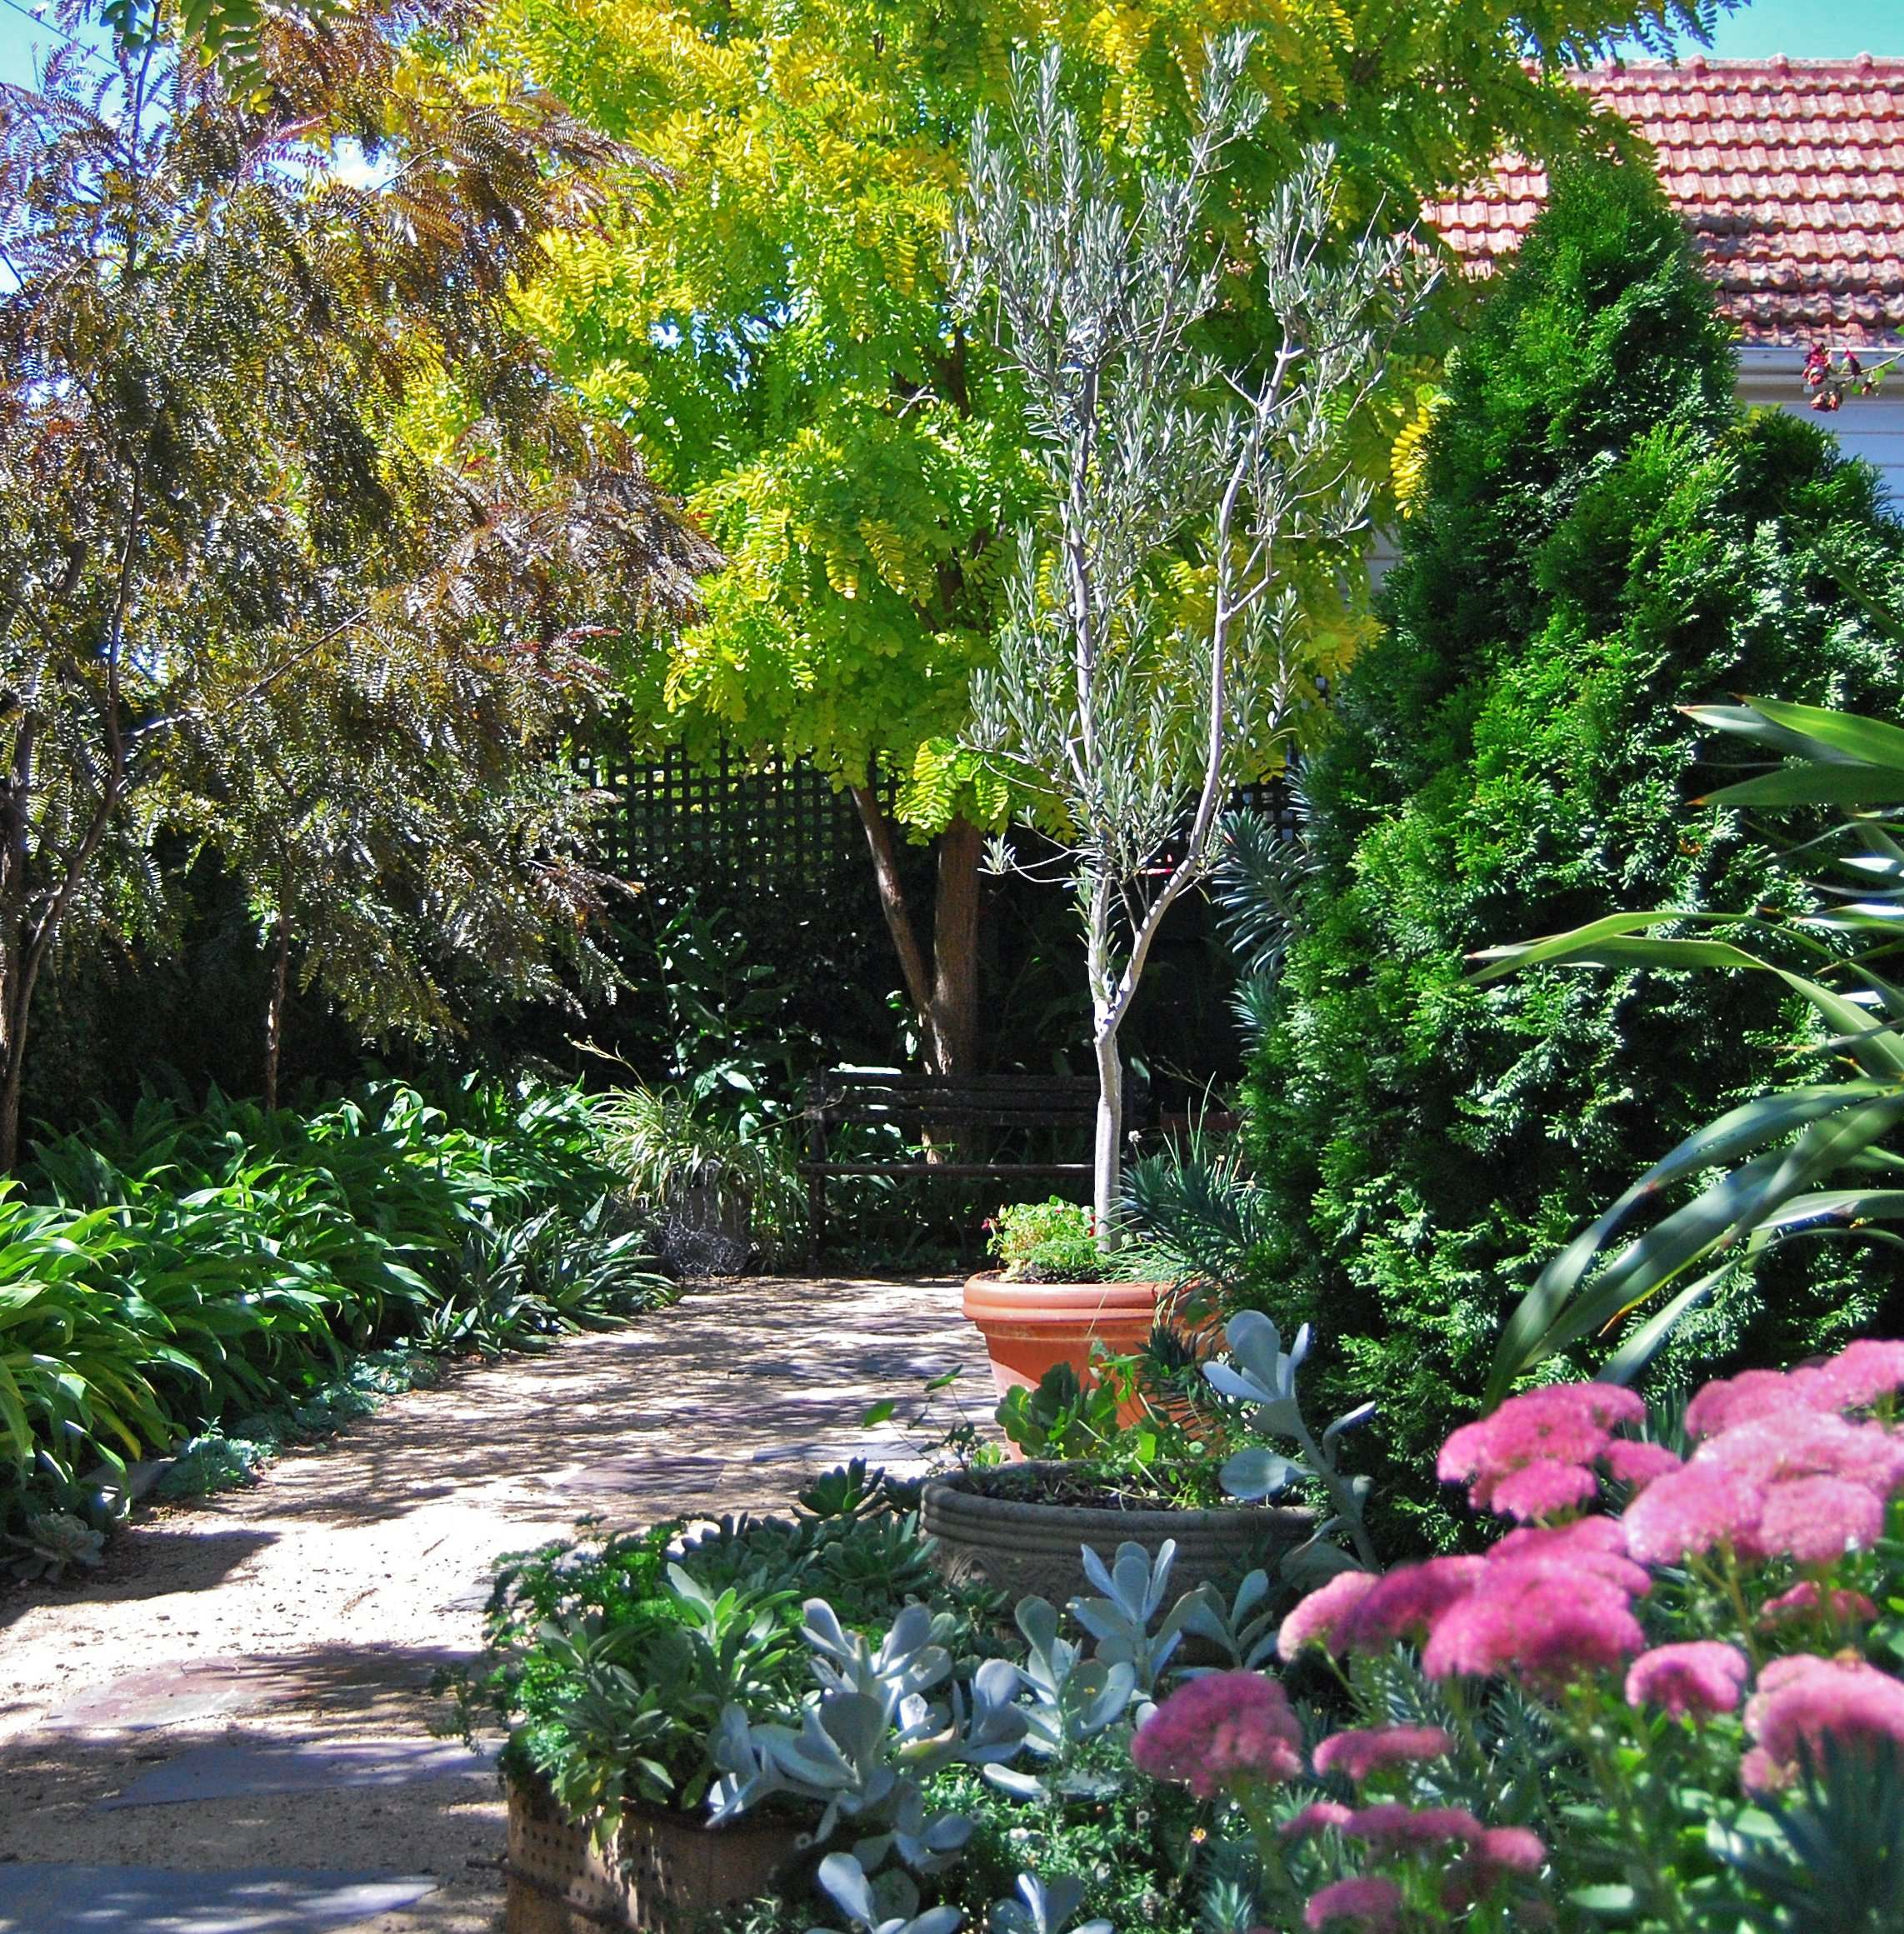 Dappled shade of the Gleditsia